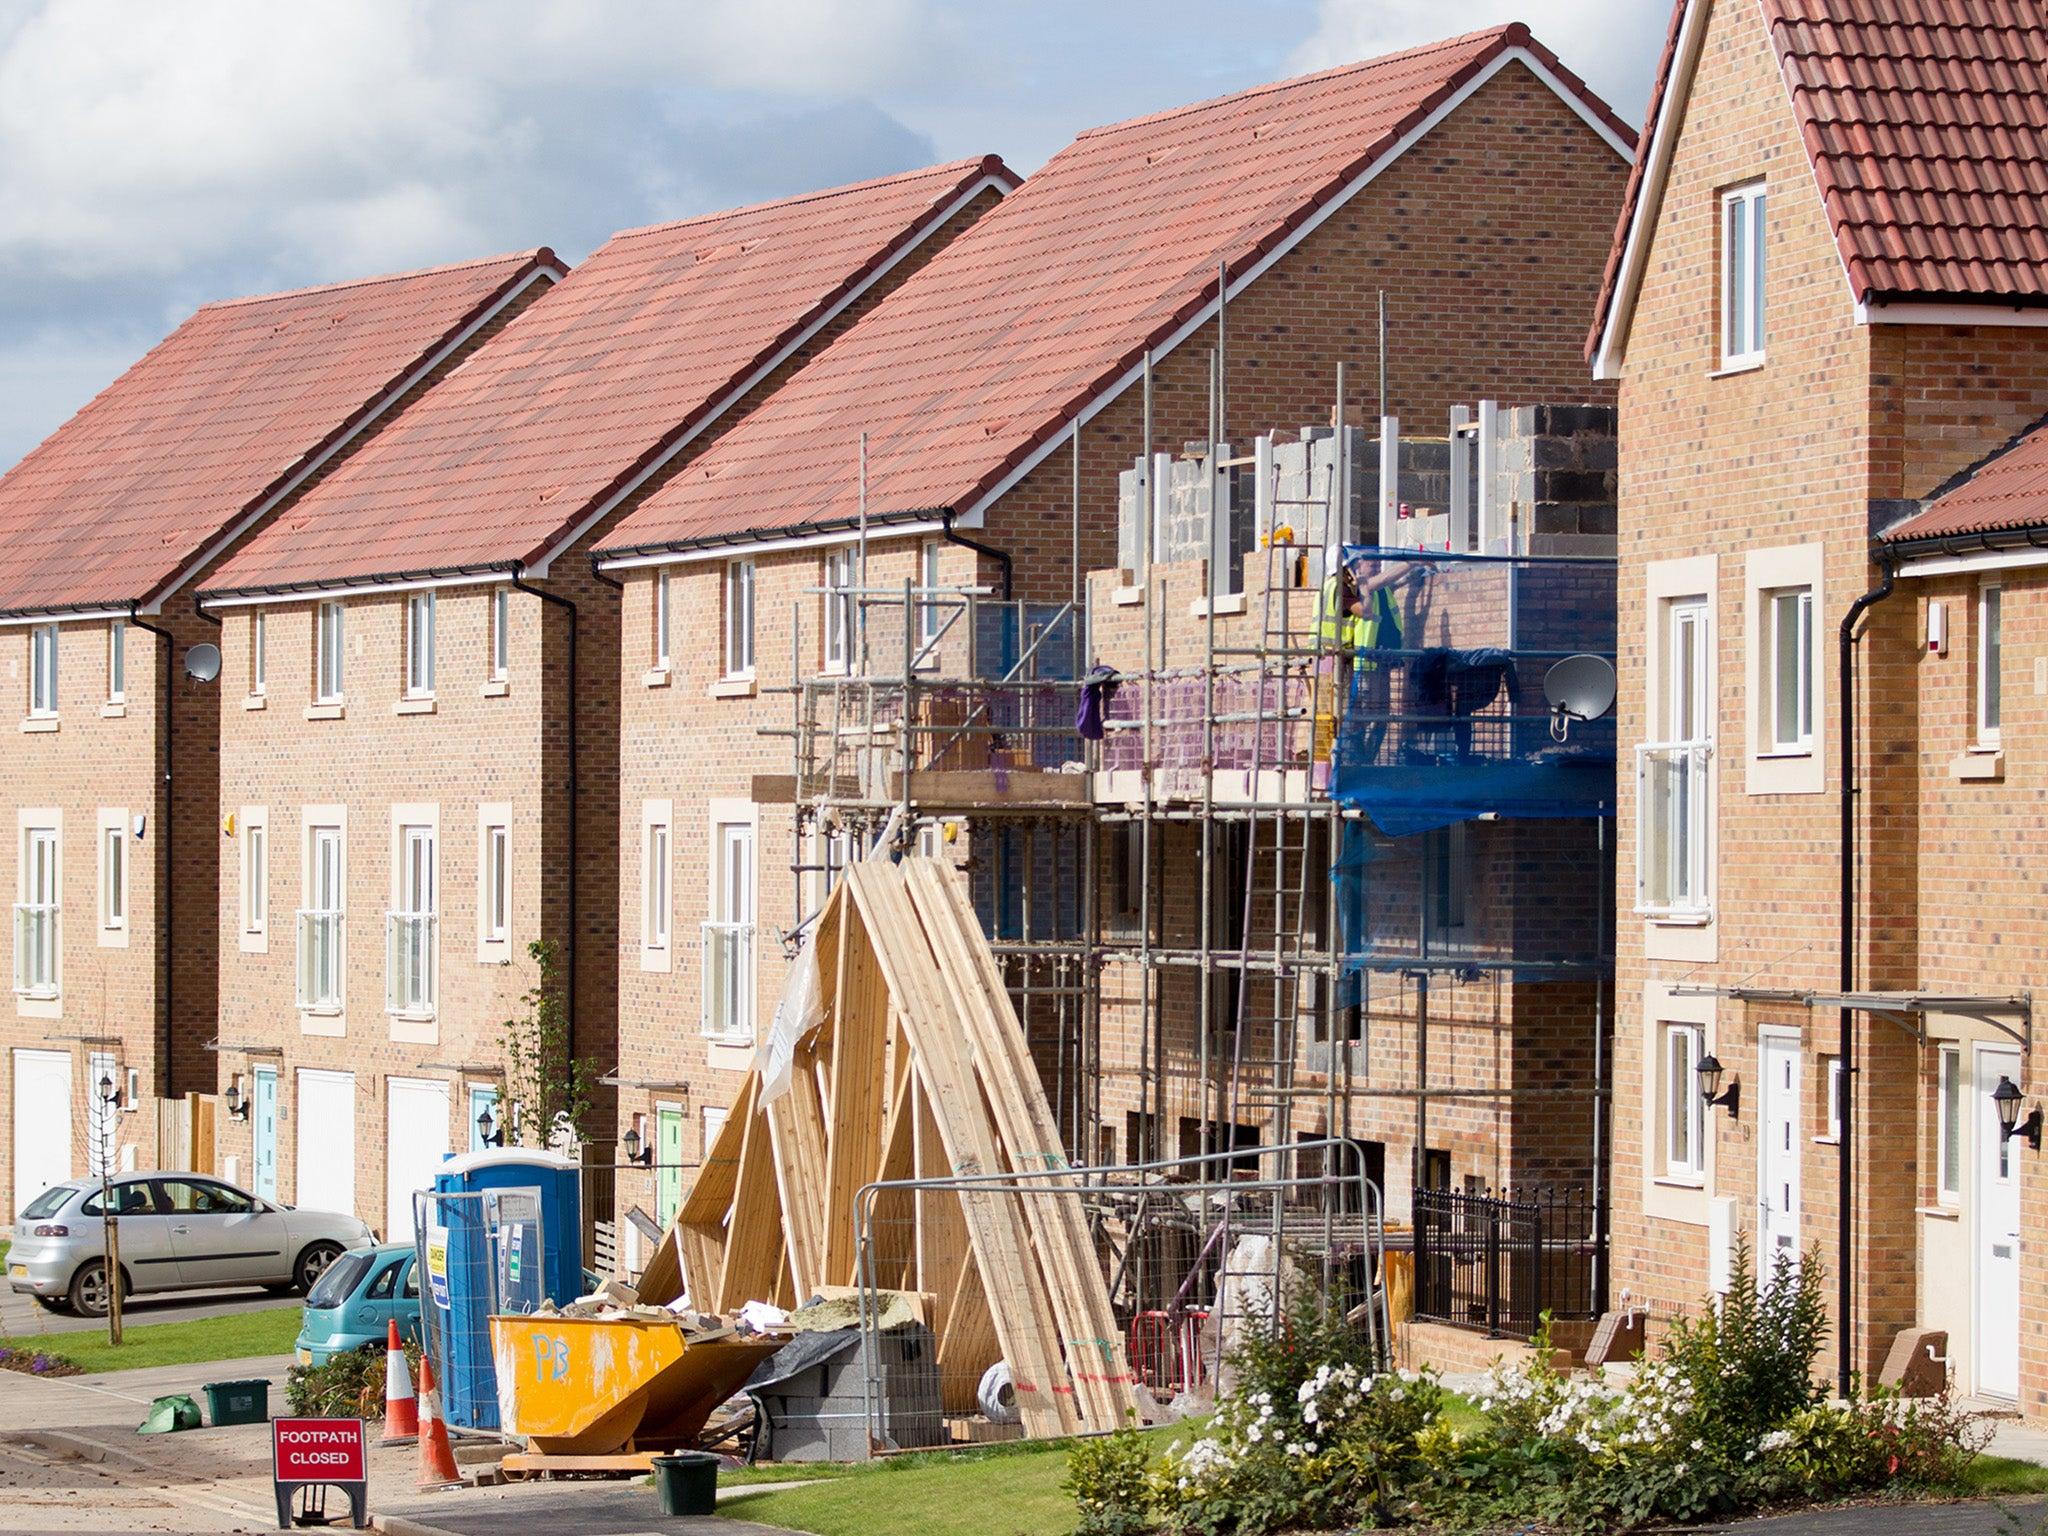 UK construction worker shortage hits record, warns trade association